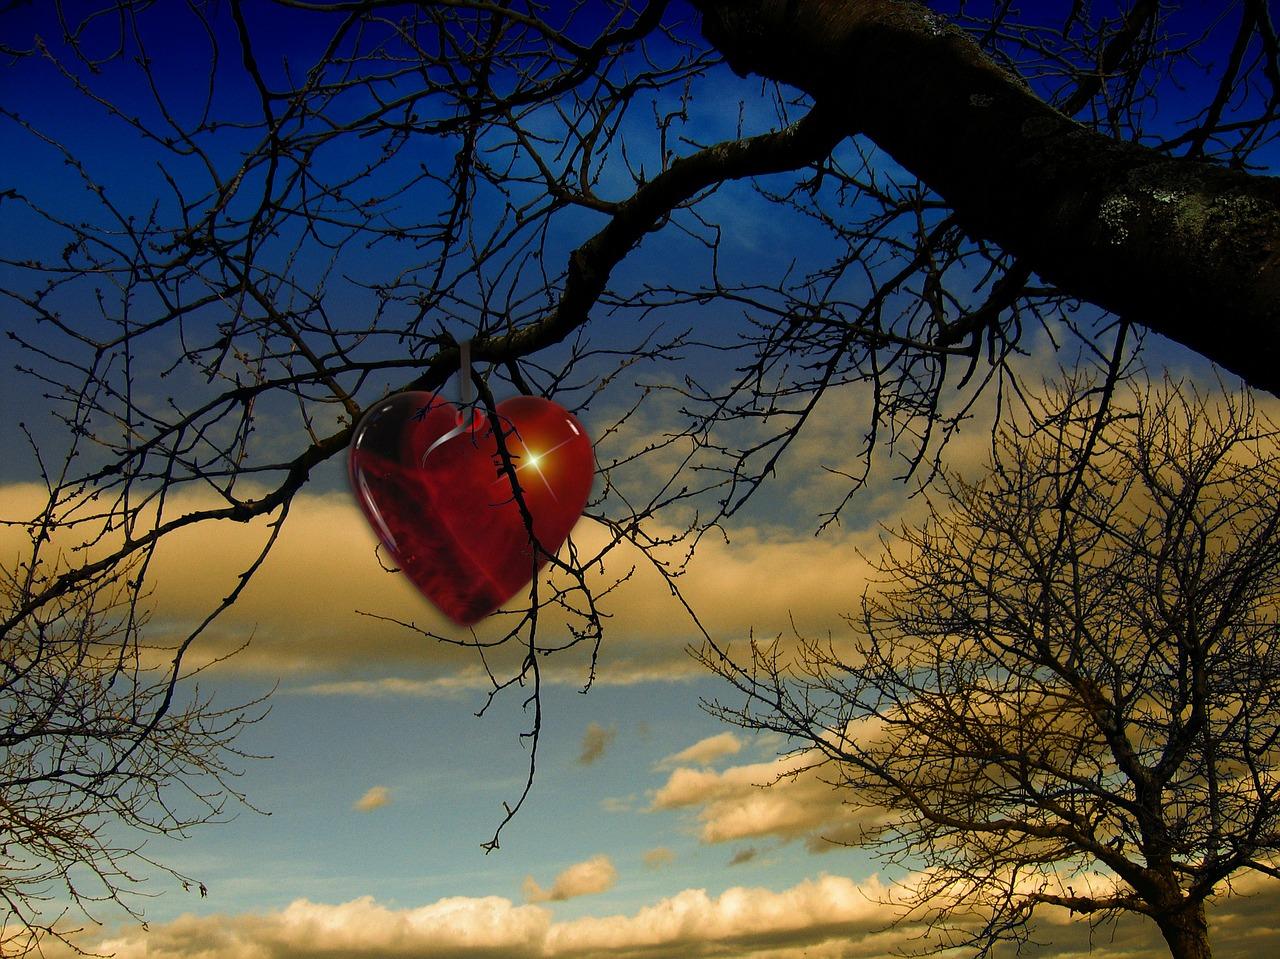 tree-68197_1280.jpg